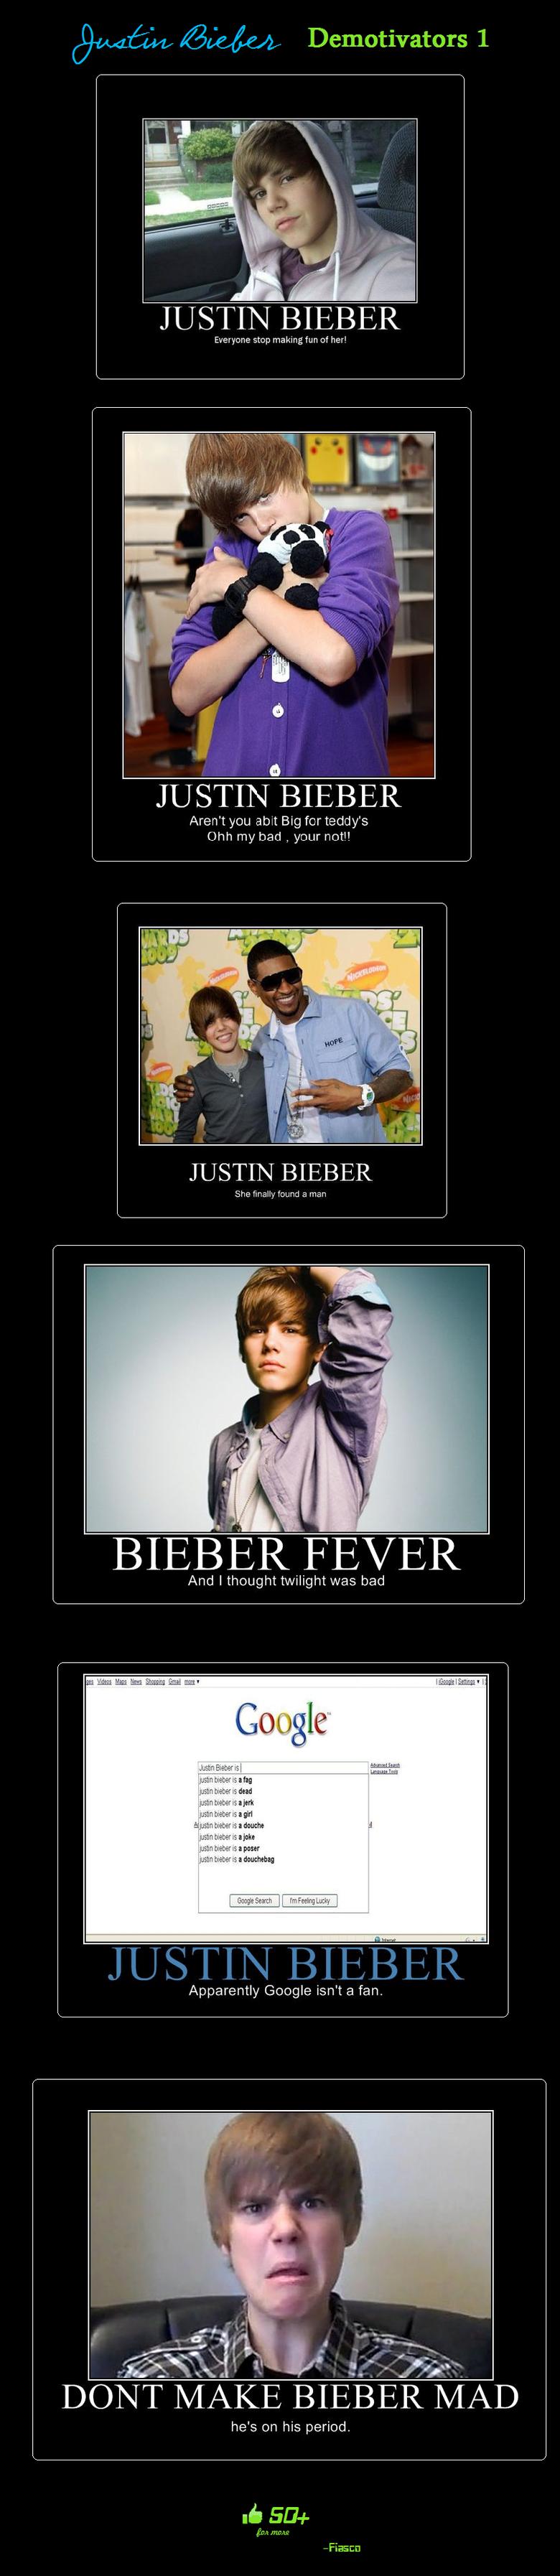 Justin Bieber Demotivators!. Justin Bieber Demotivators part 1, <br /> Part 2 - hfunnyjunk.com/funny_pictures/500386/Justin+Bieber+Demotivators+2/<br / justin bieber